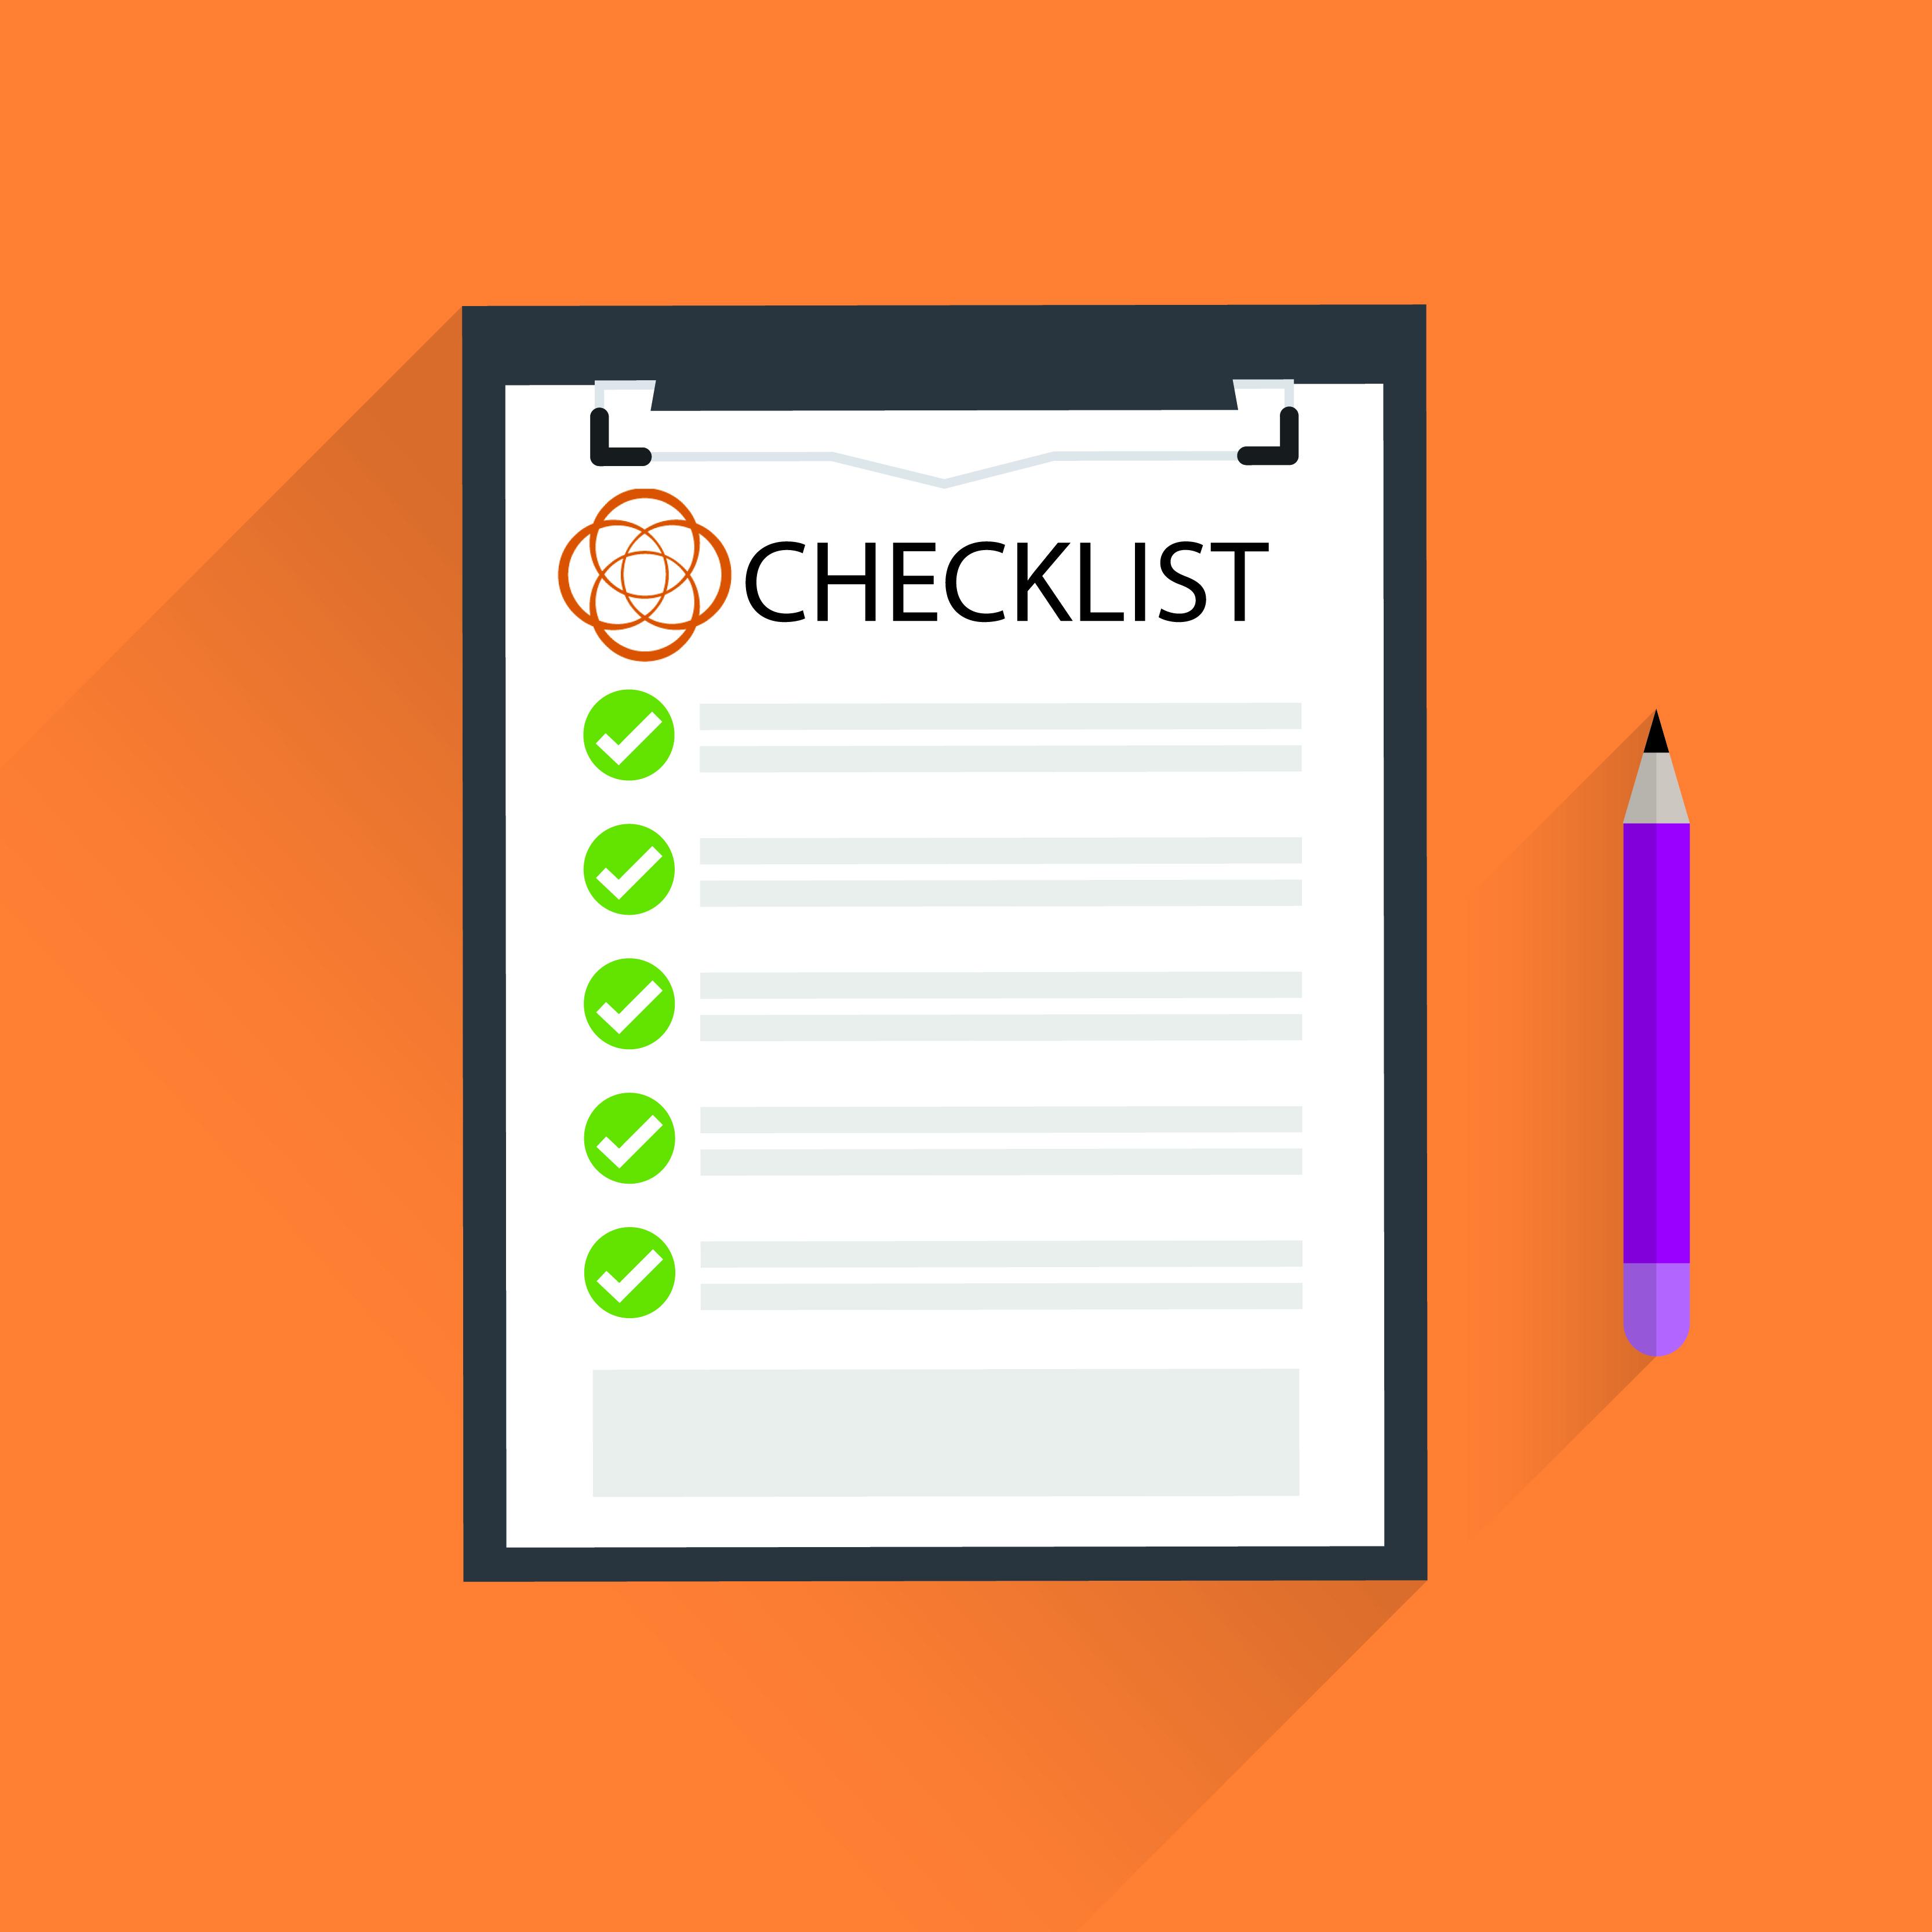 Checklist  Image.jpg